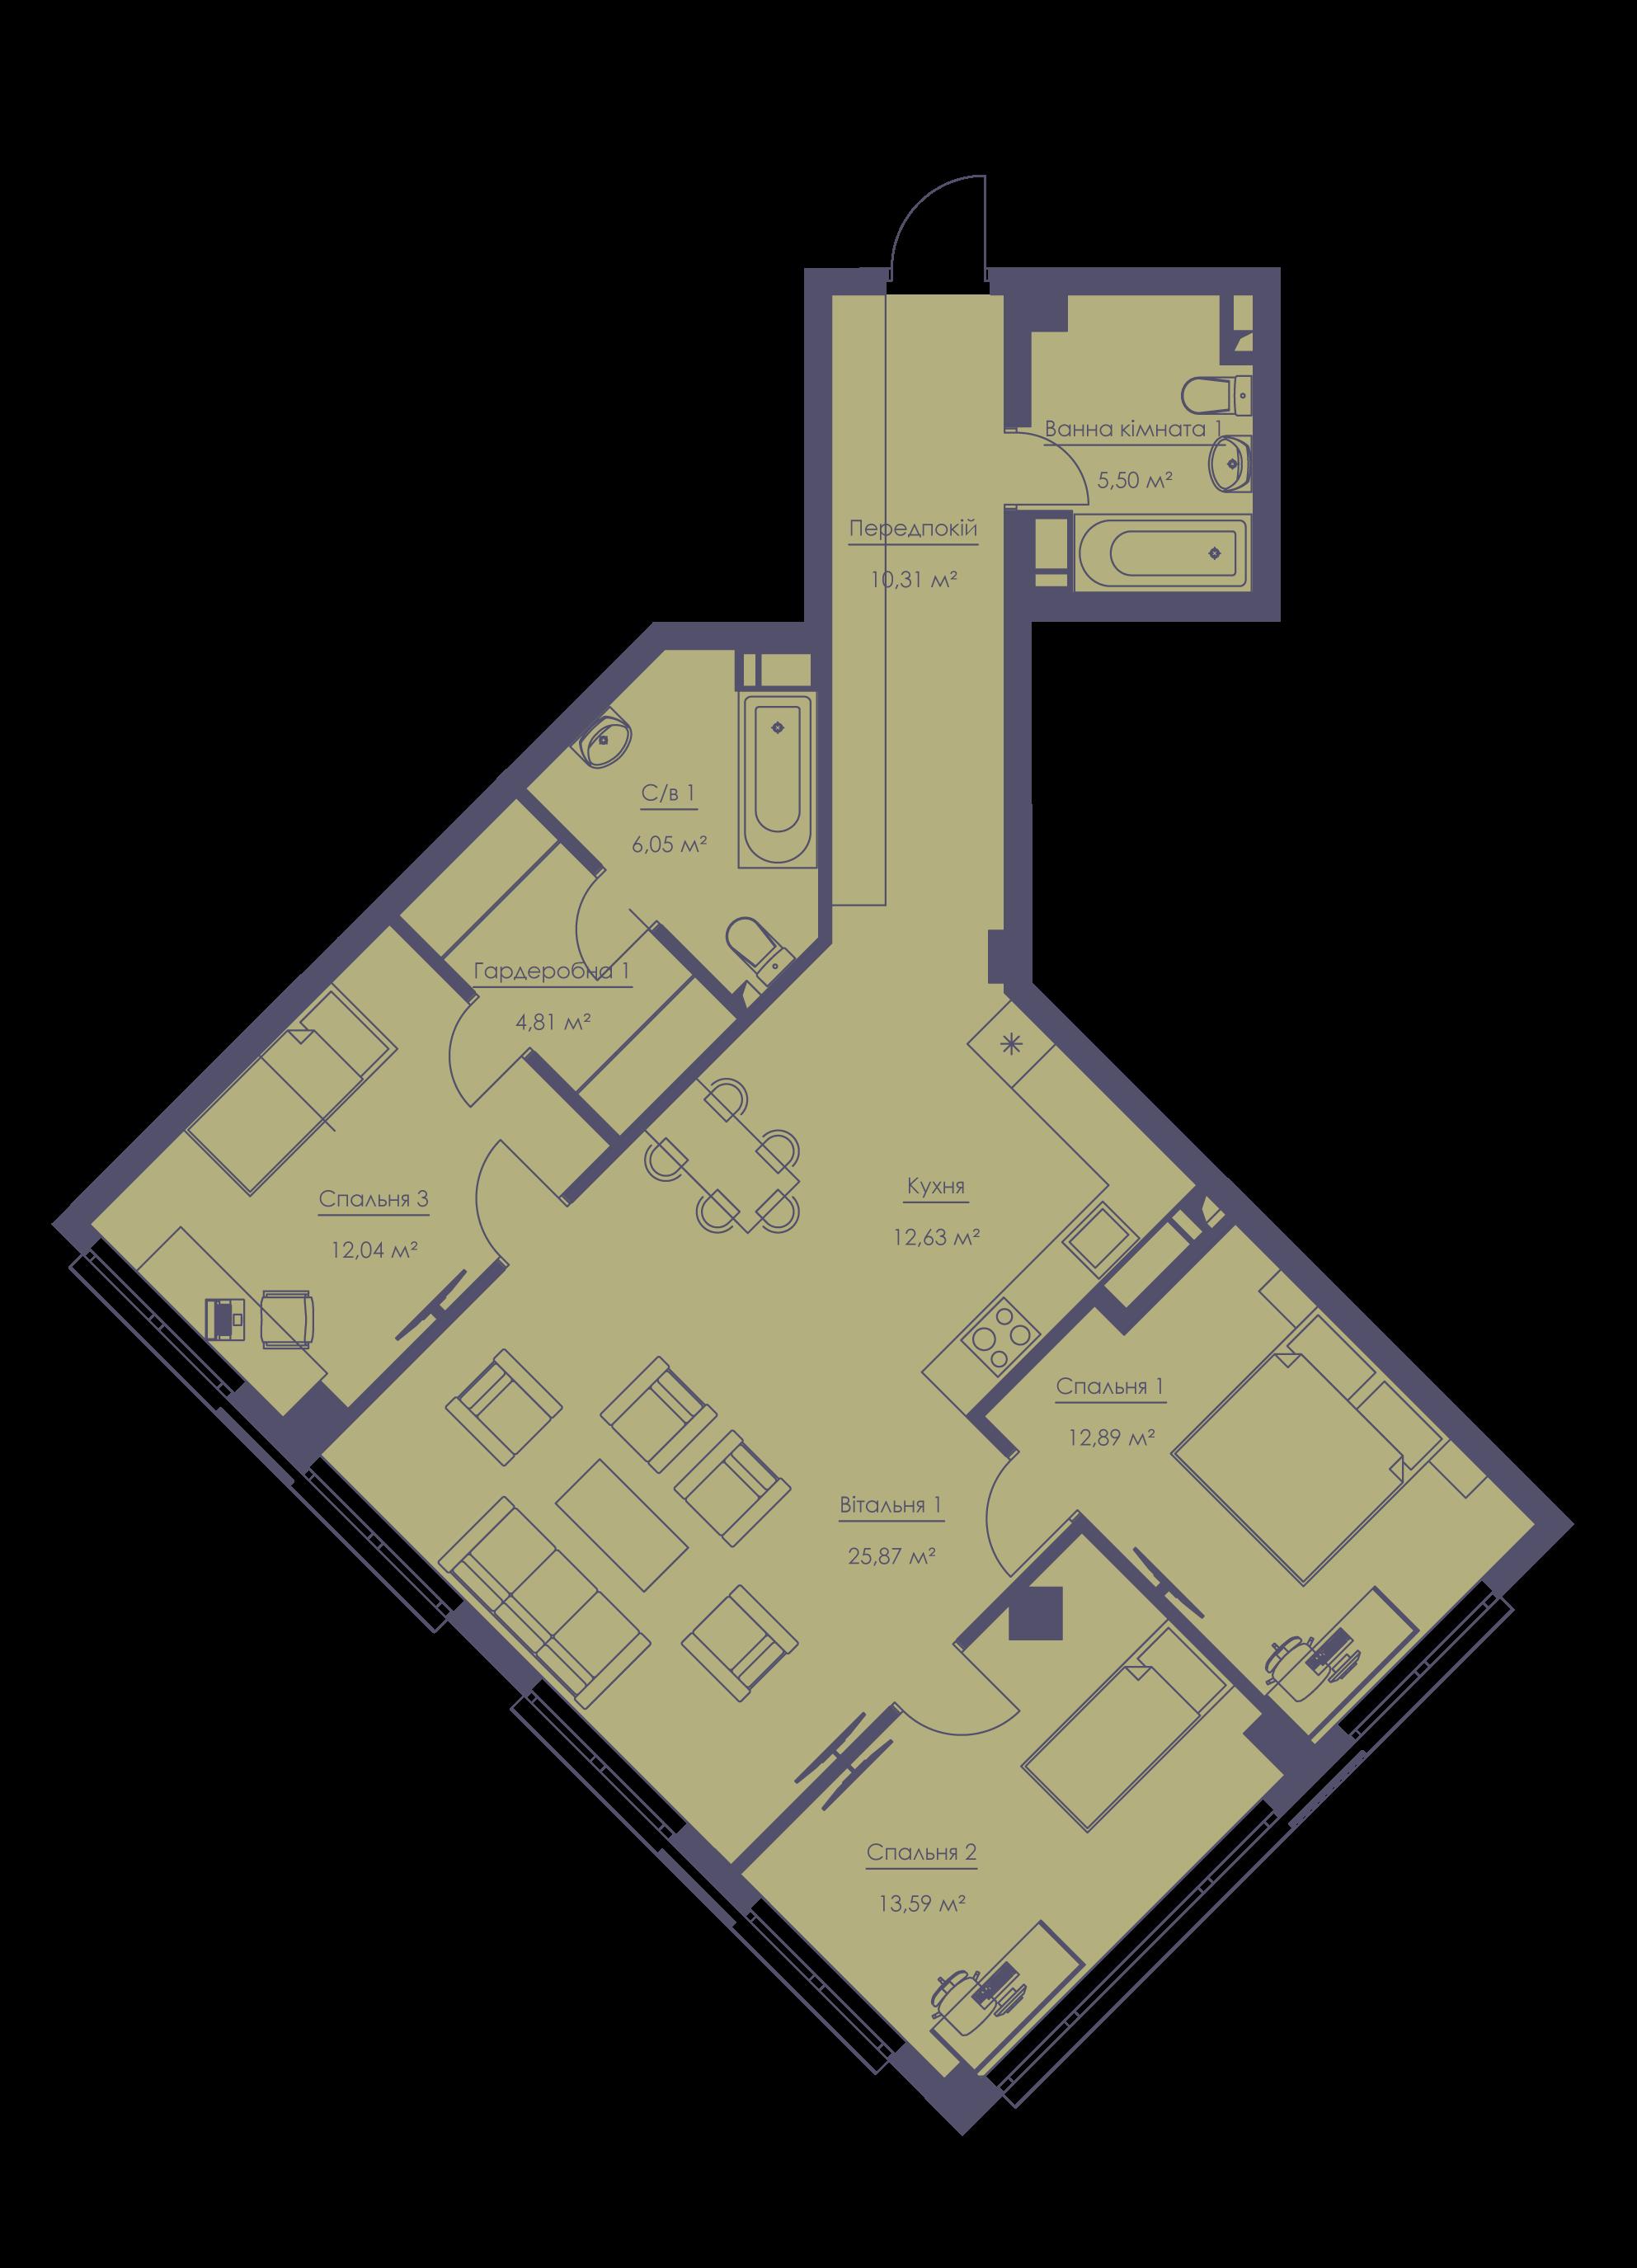 Apartment layout KV_81_4a_1_1_2-1